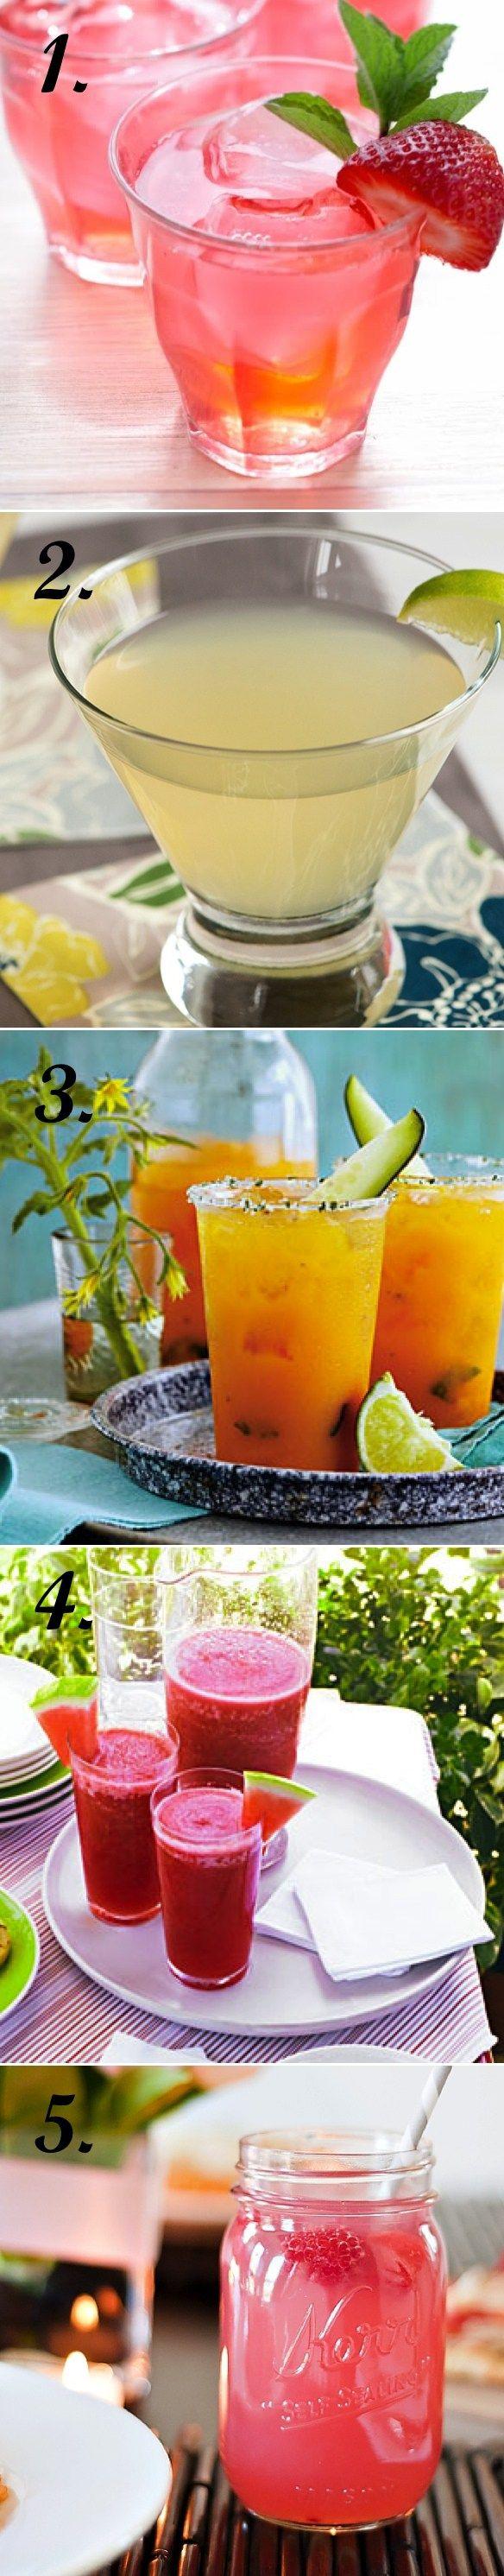 5 summer coctails recipes